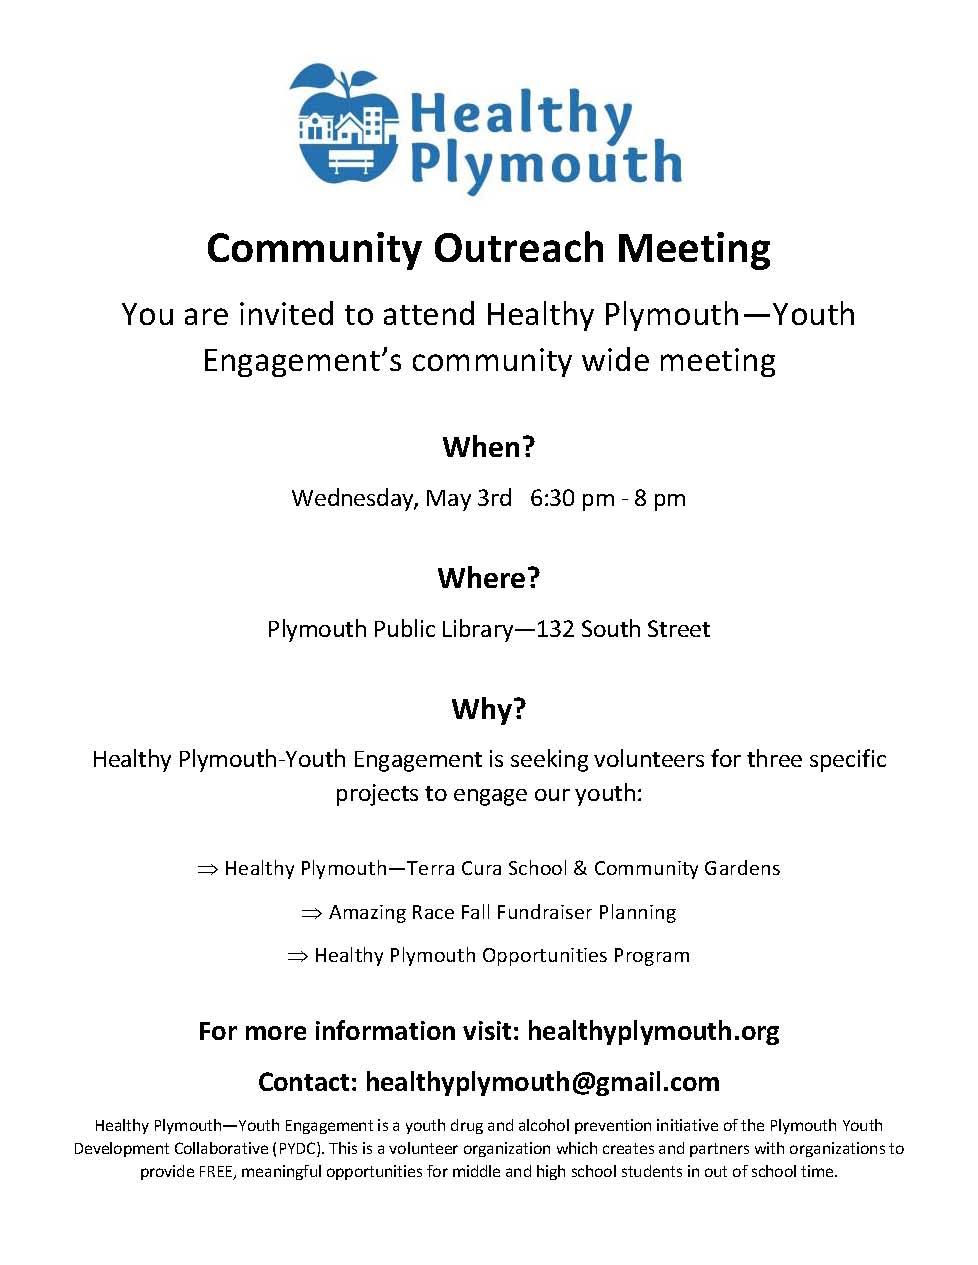 Community Meeting Flyer  05032017.jpg